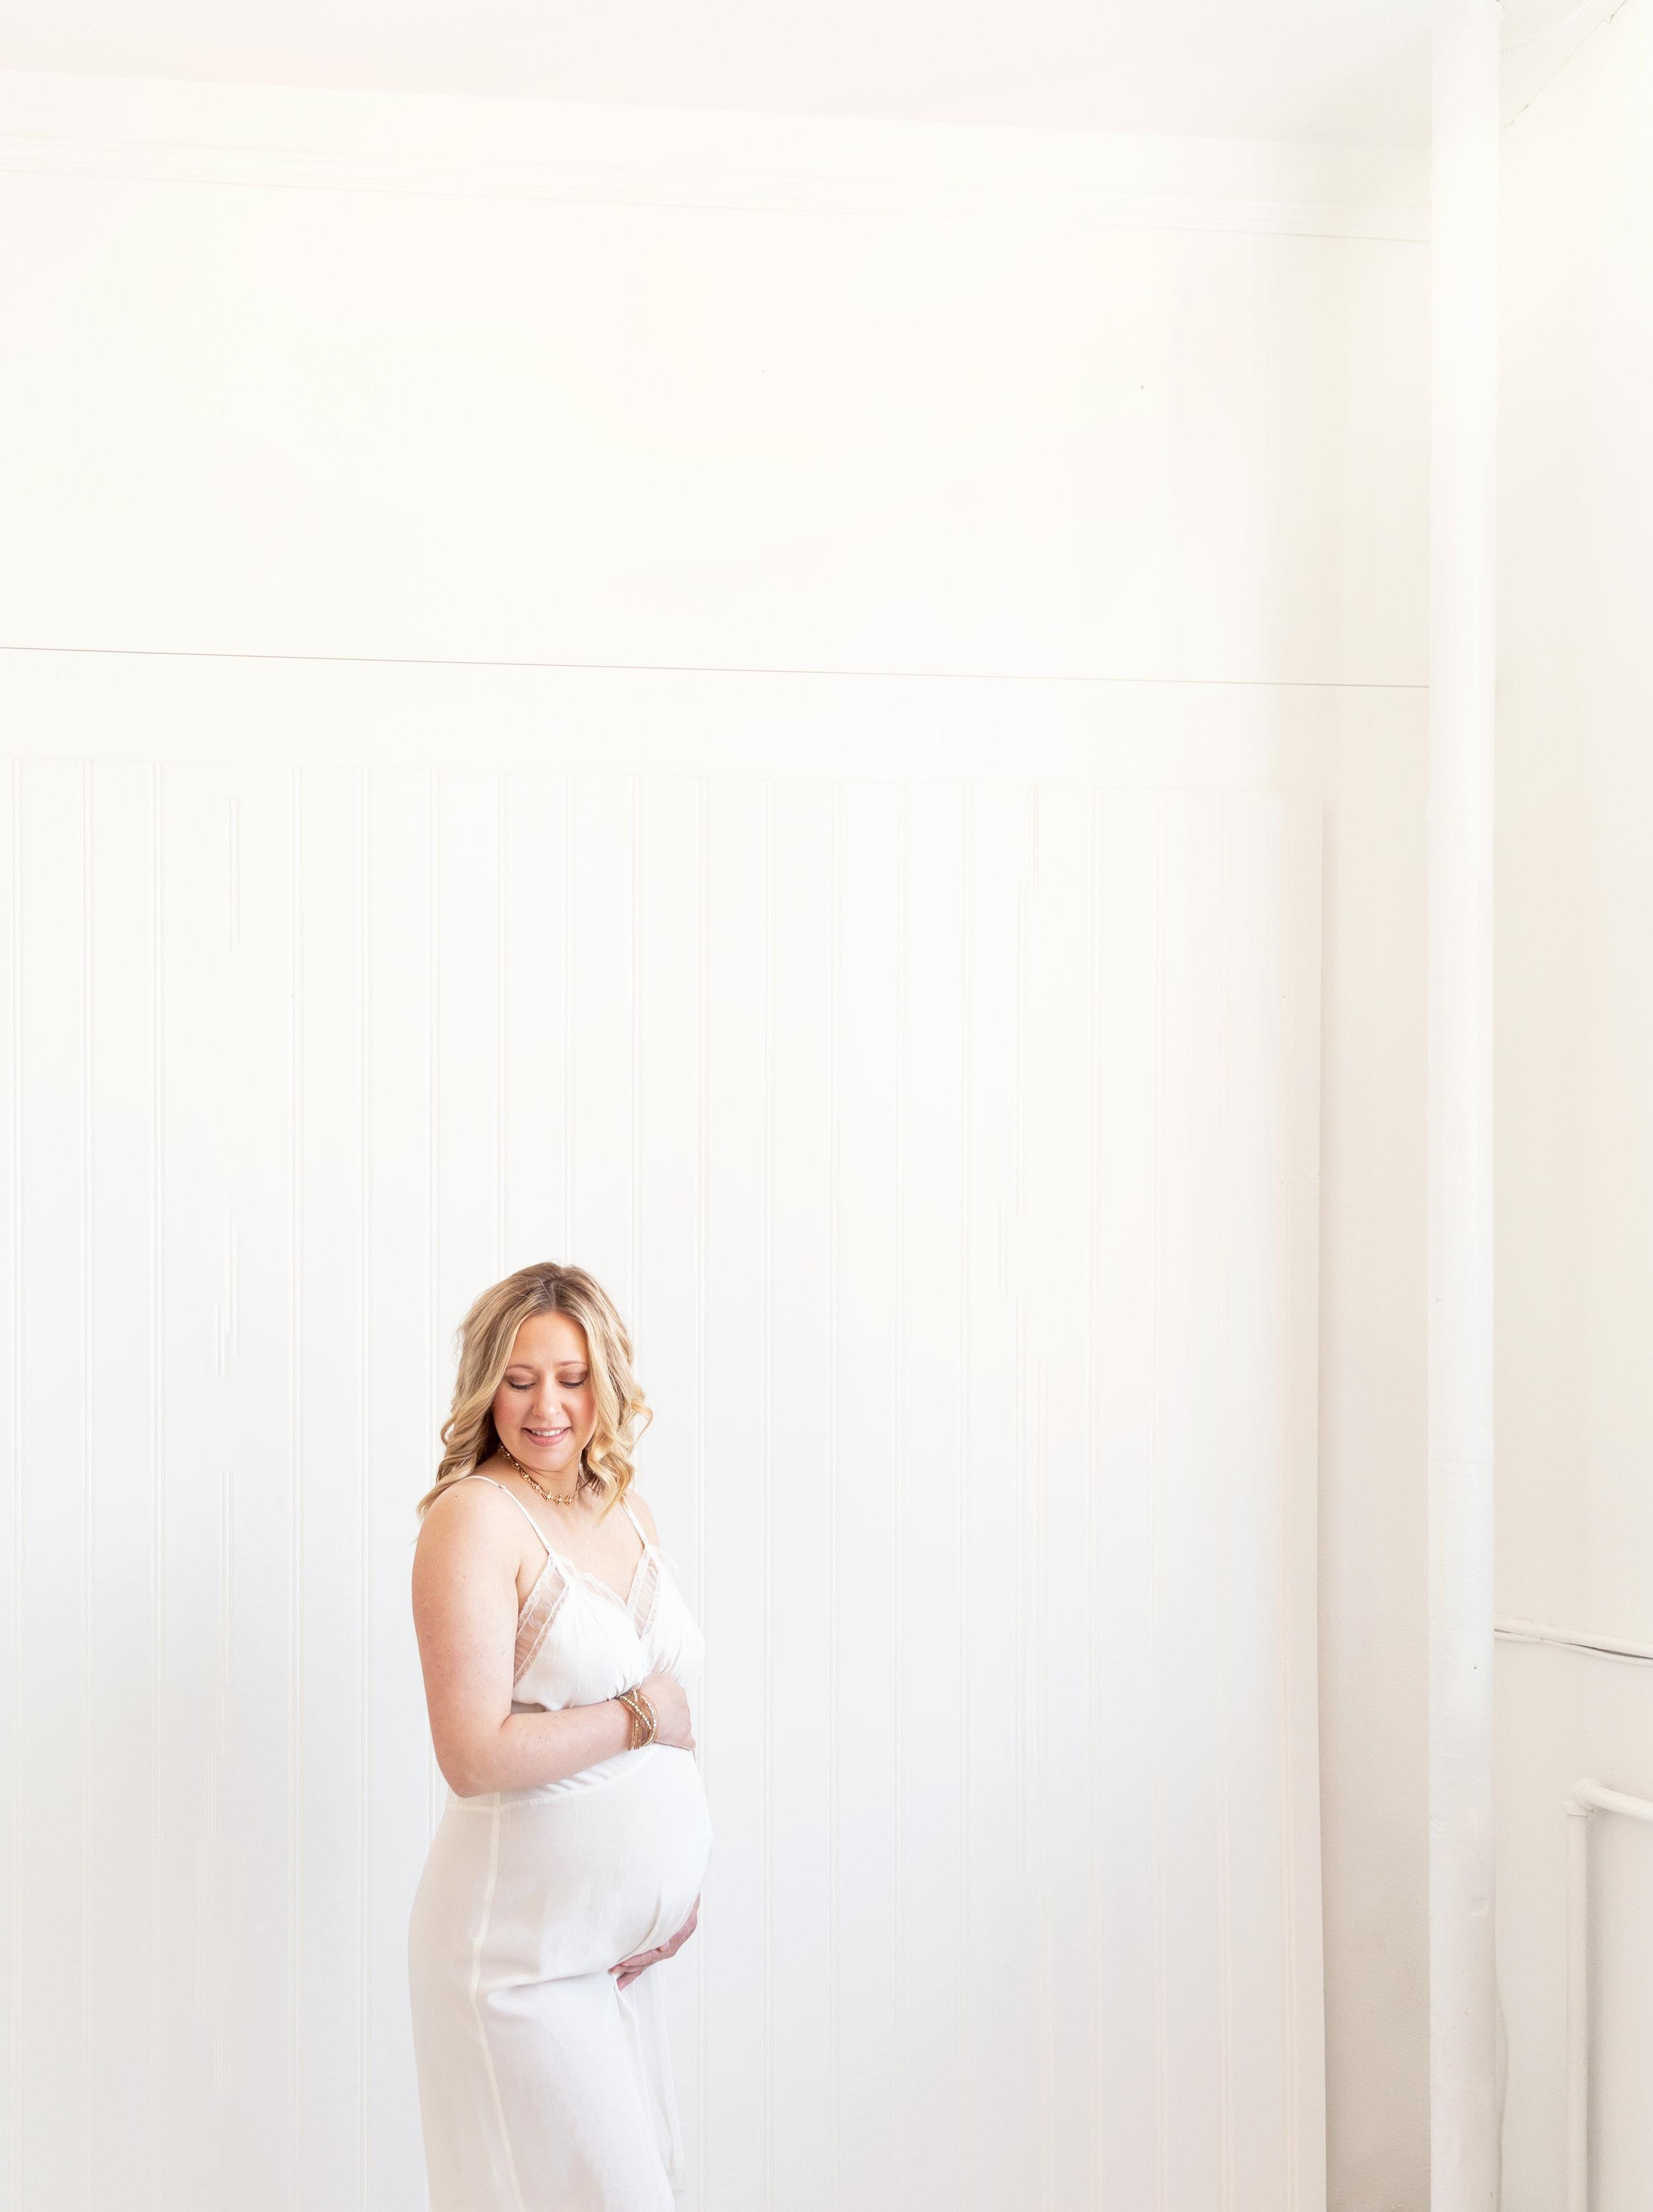 5 staci maternity boudoir studio jennys boudoir jenny miller 20 march 2019.jpg